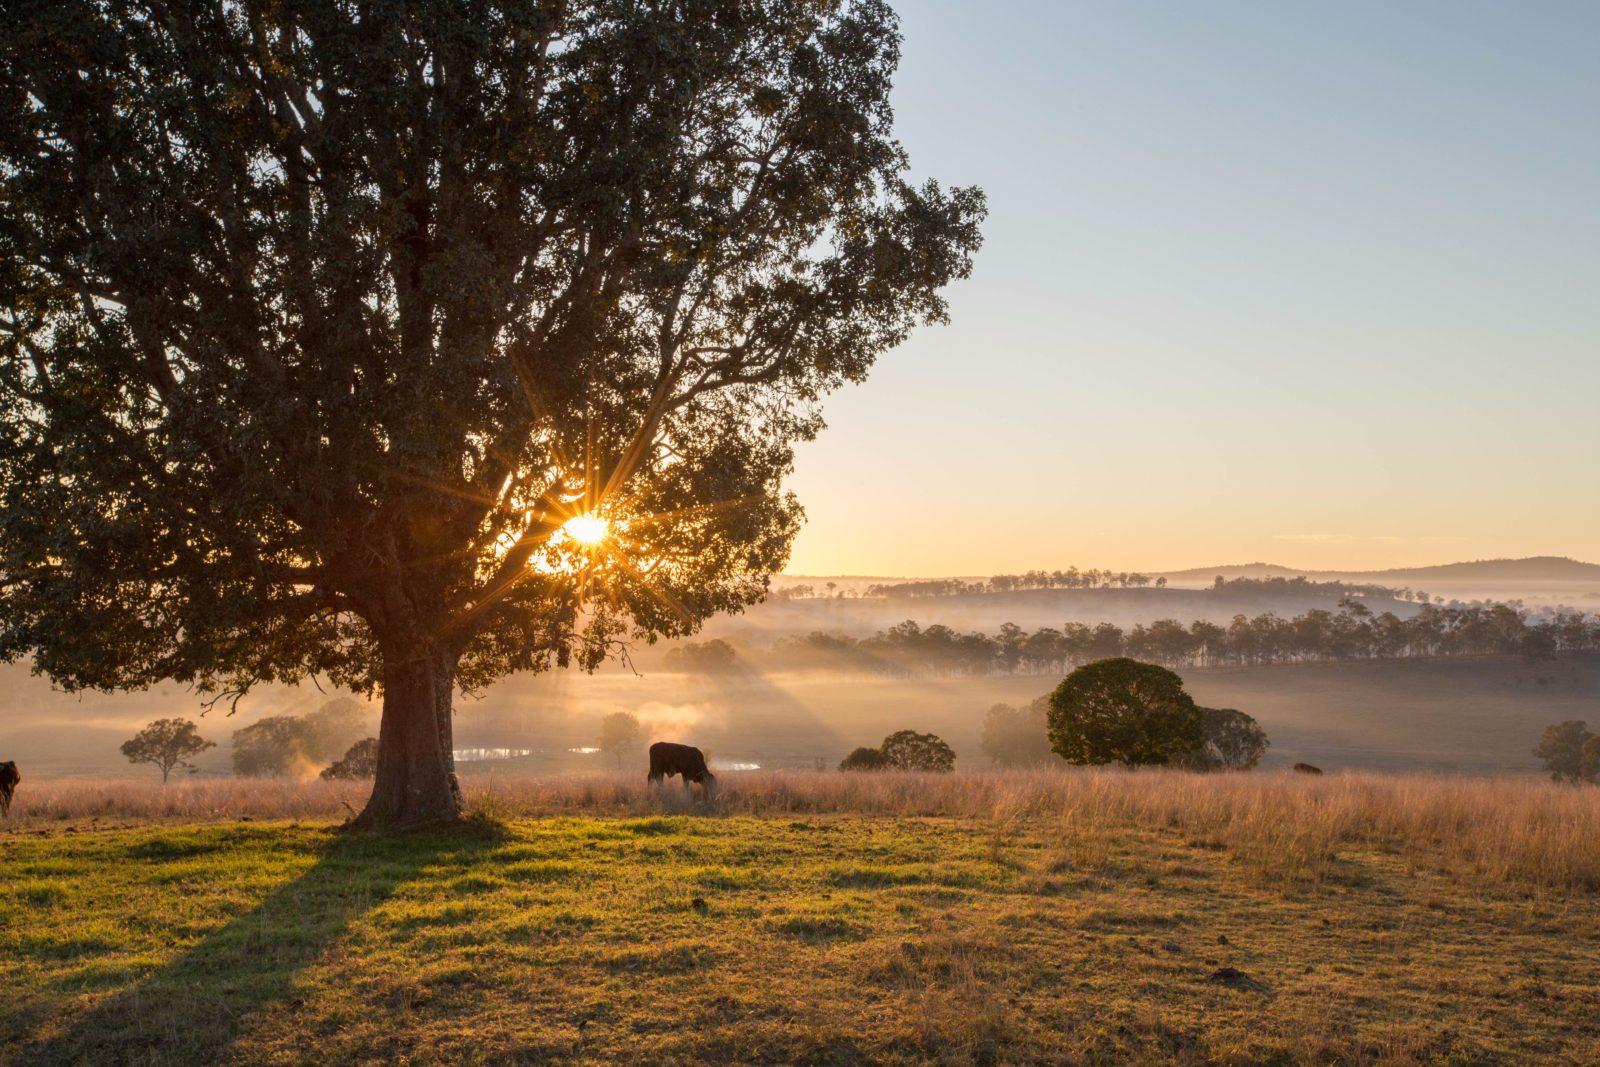 Cattle grazing early sunrise